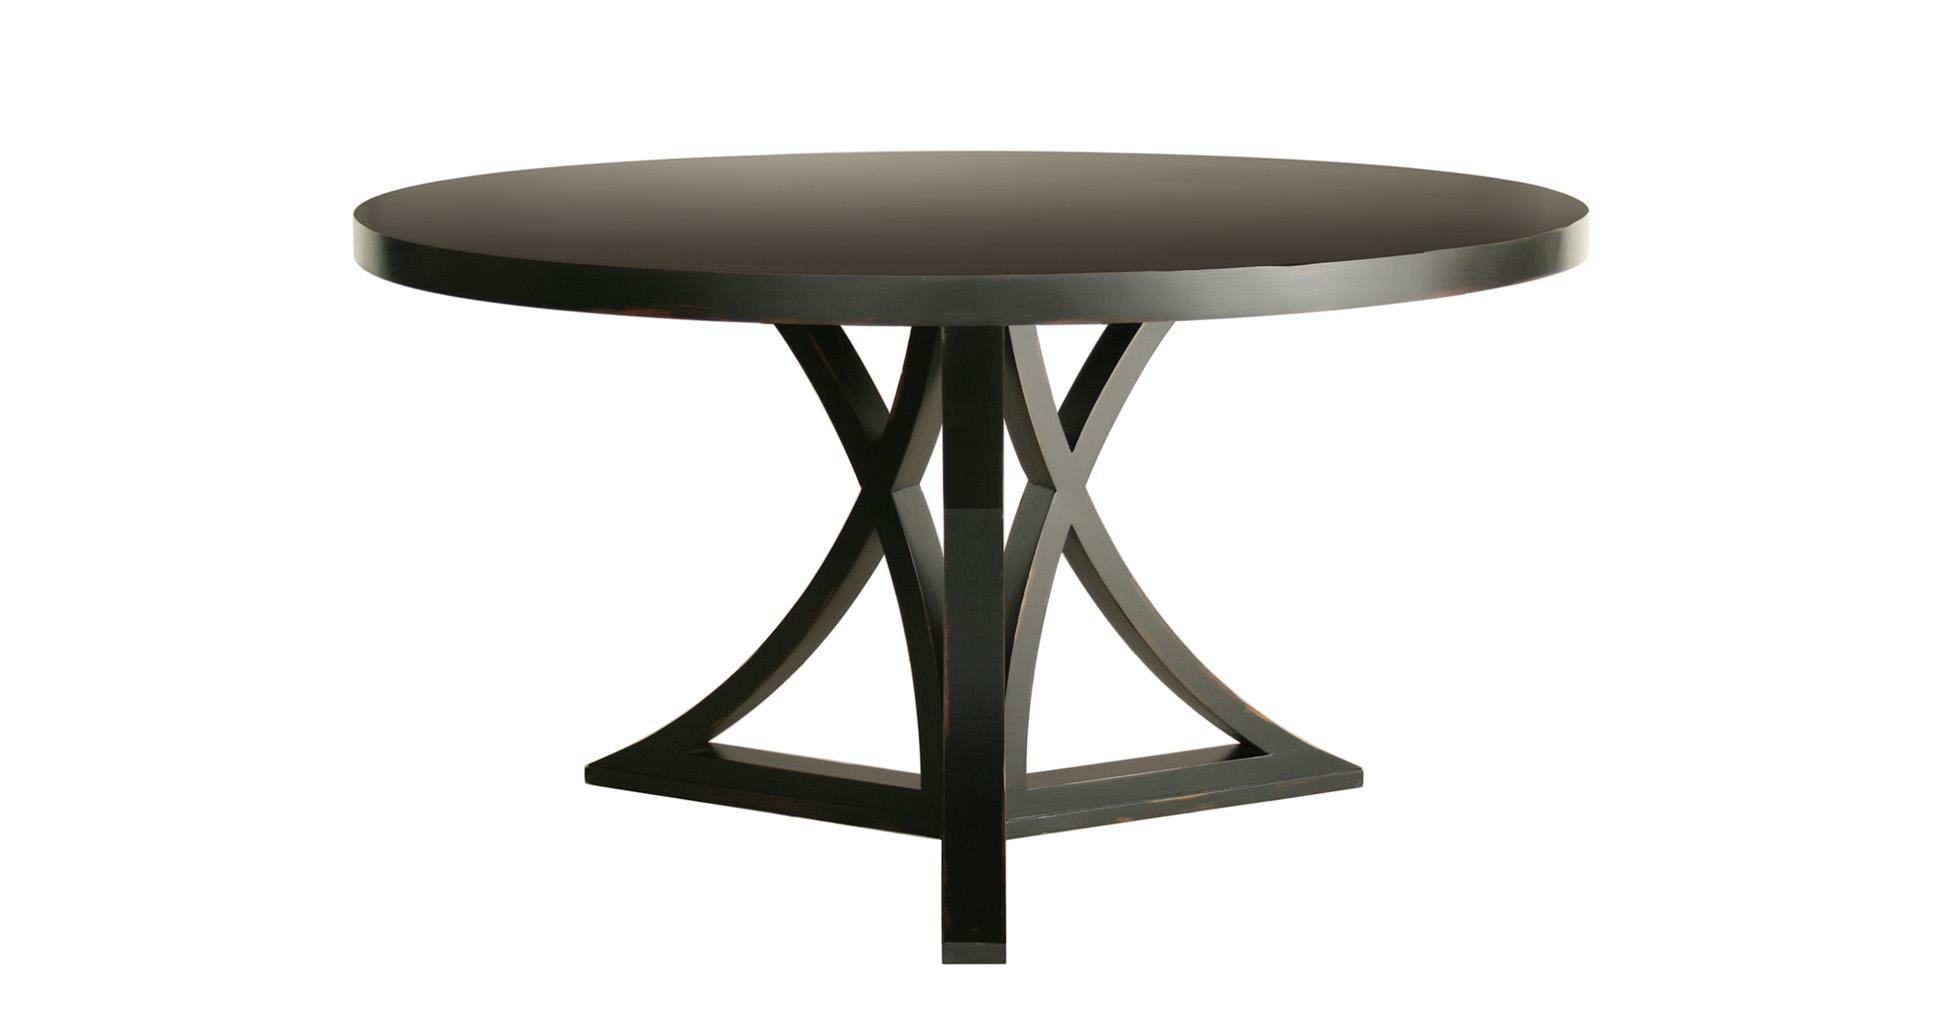 Black round kitchen table photo - 1